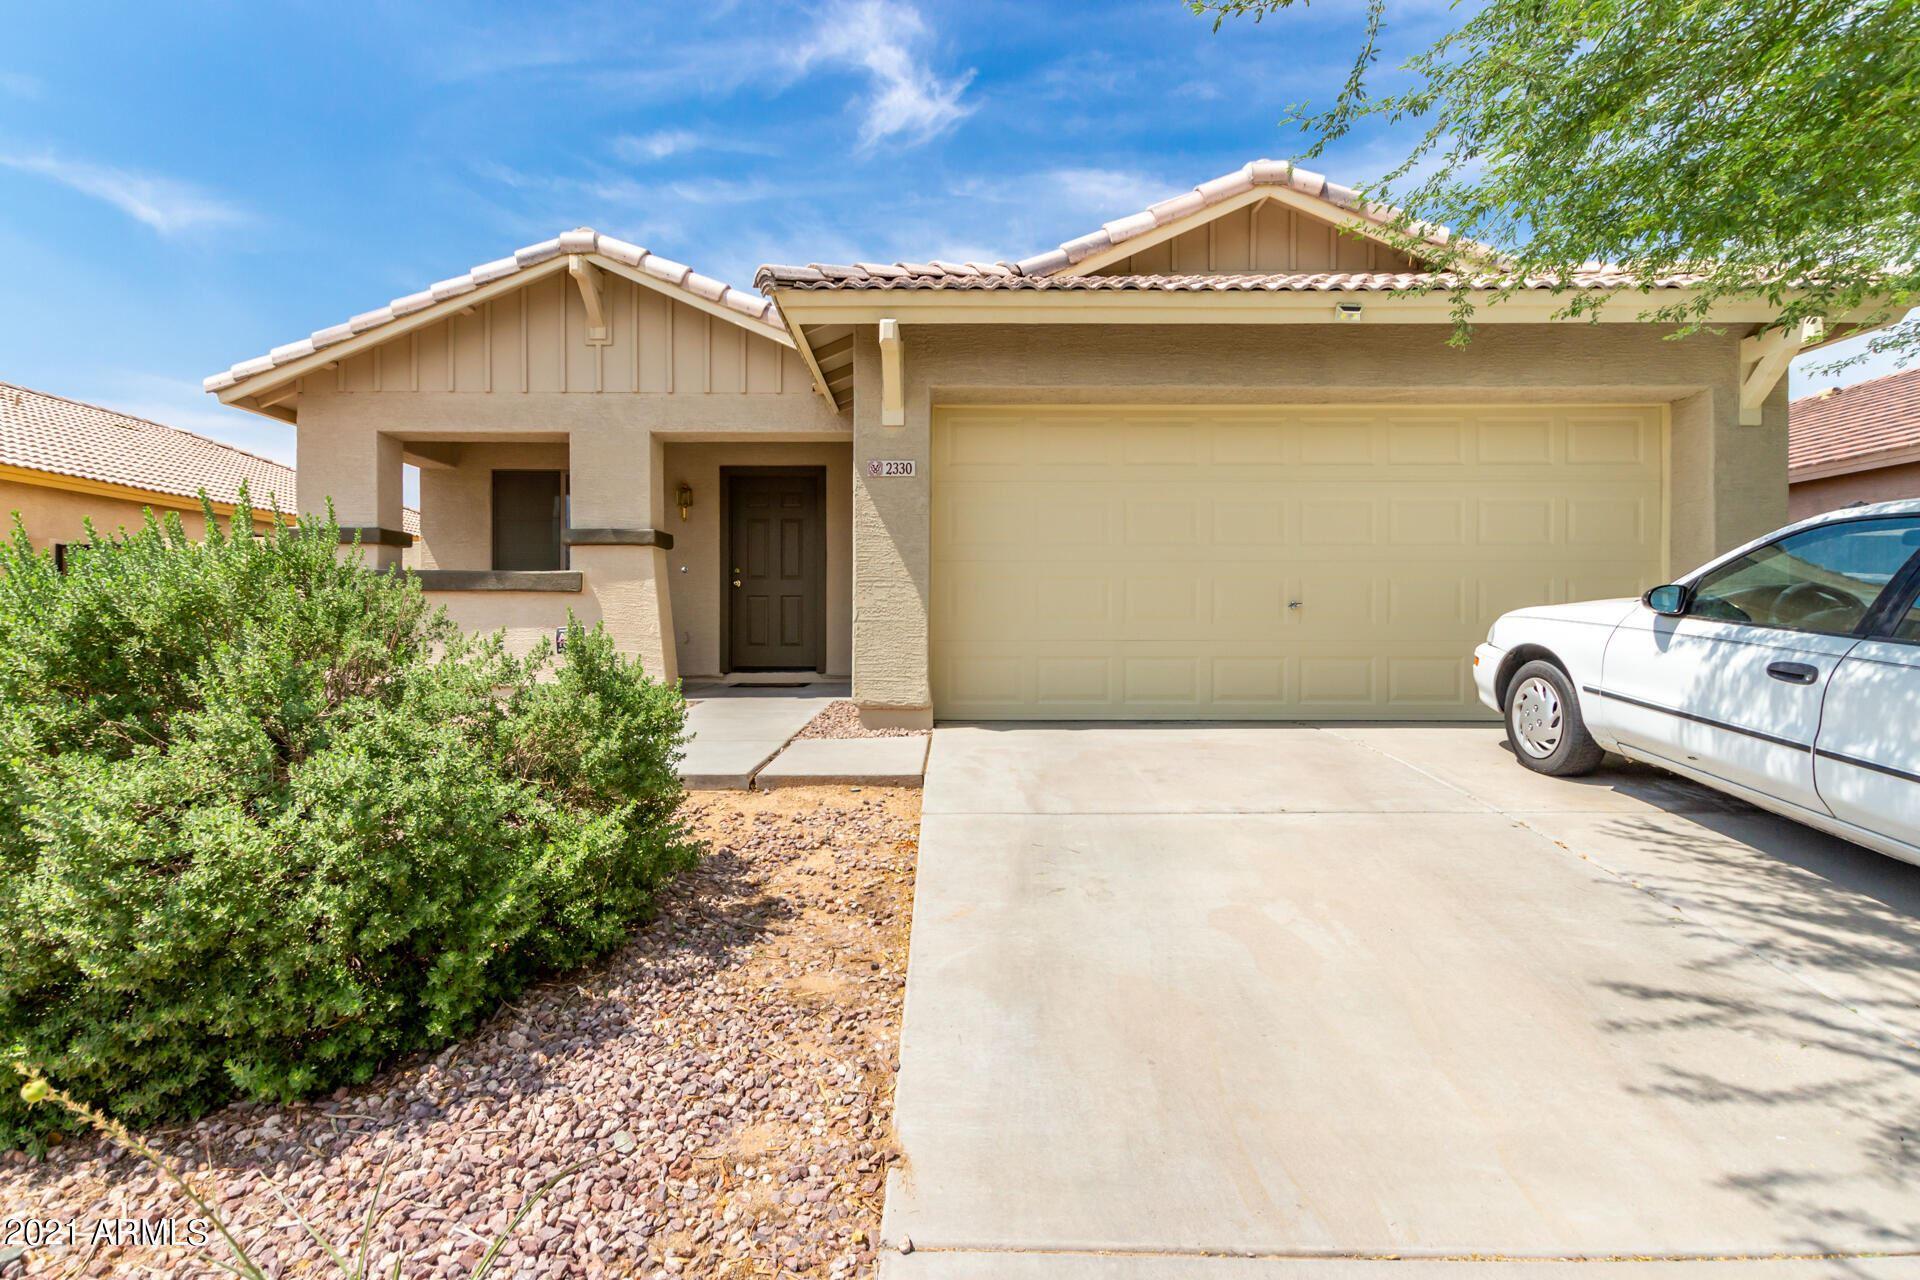 Photo of 2330 W SAINT KATERI Drive, Phoenix, AZ 85041 (MLS # 6269270)